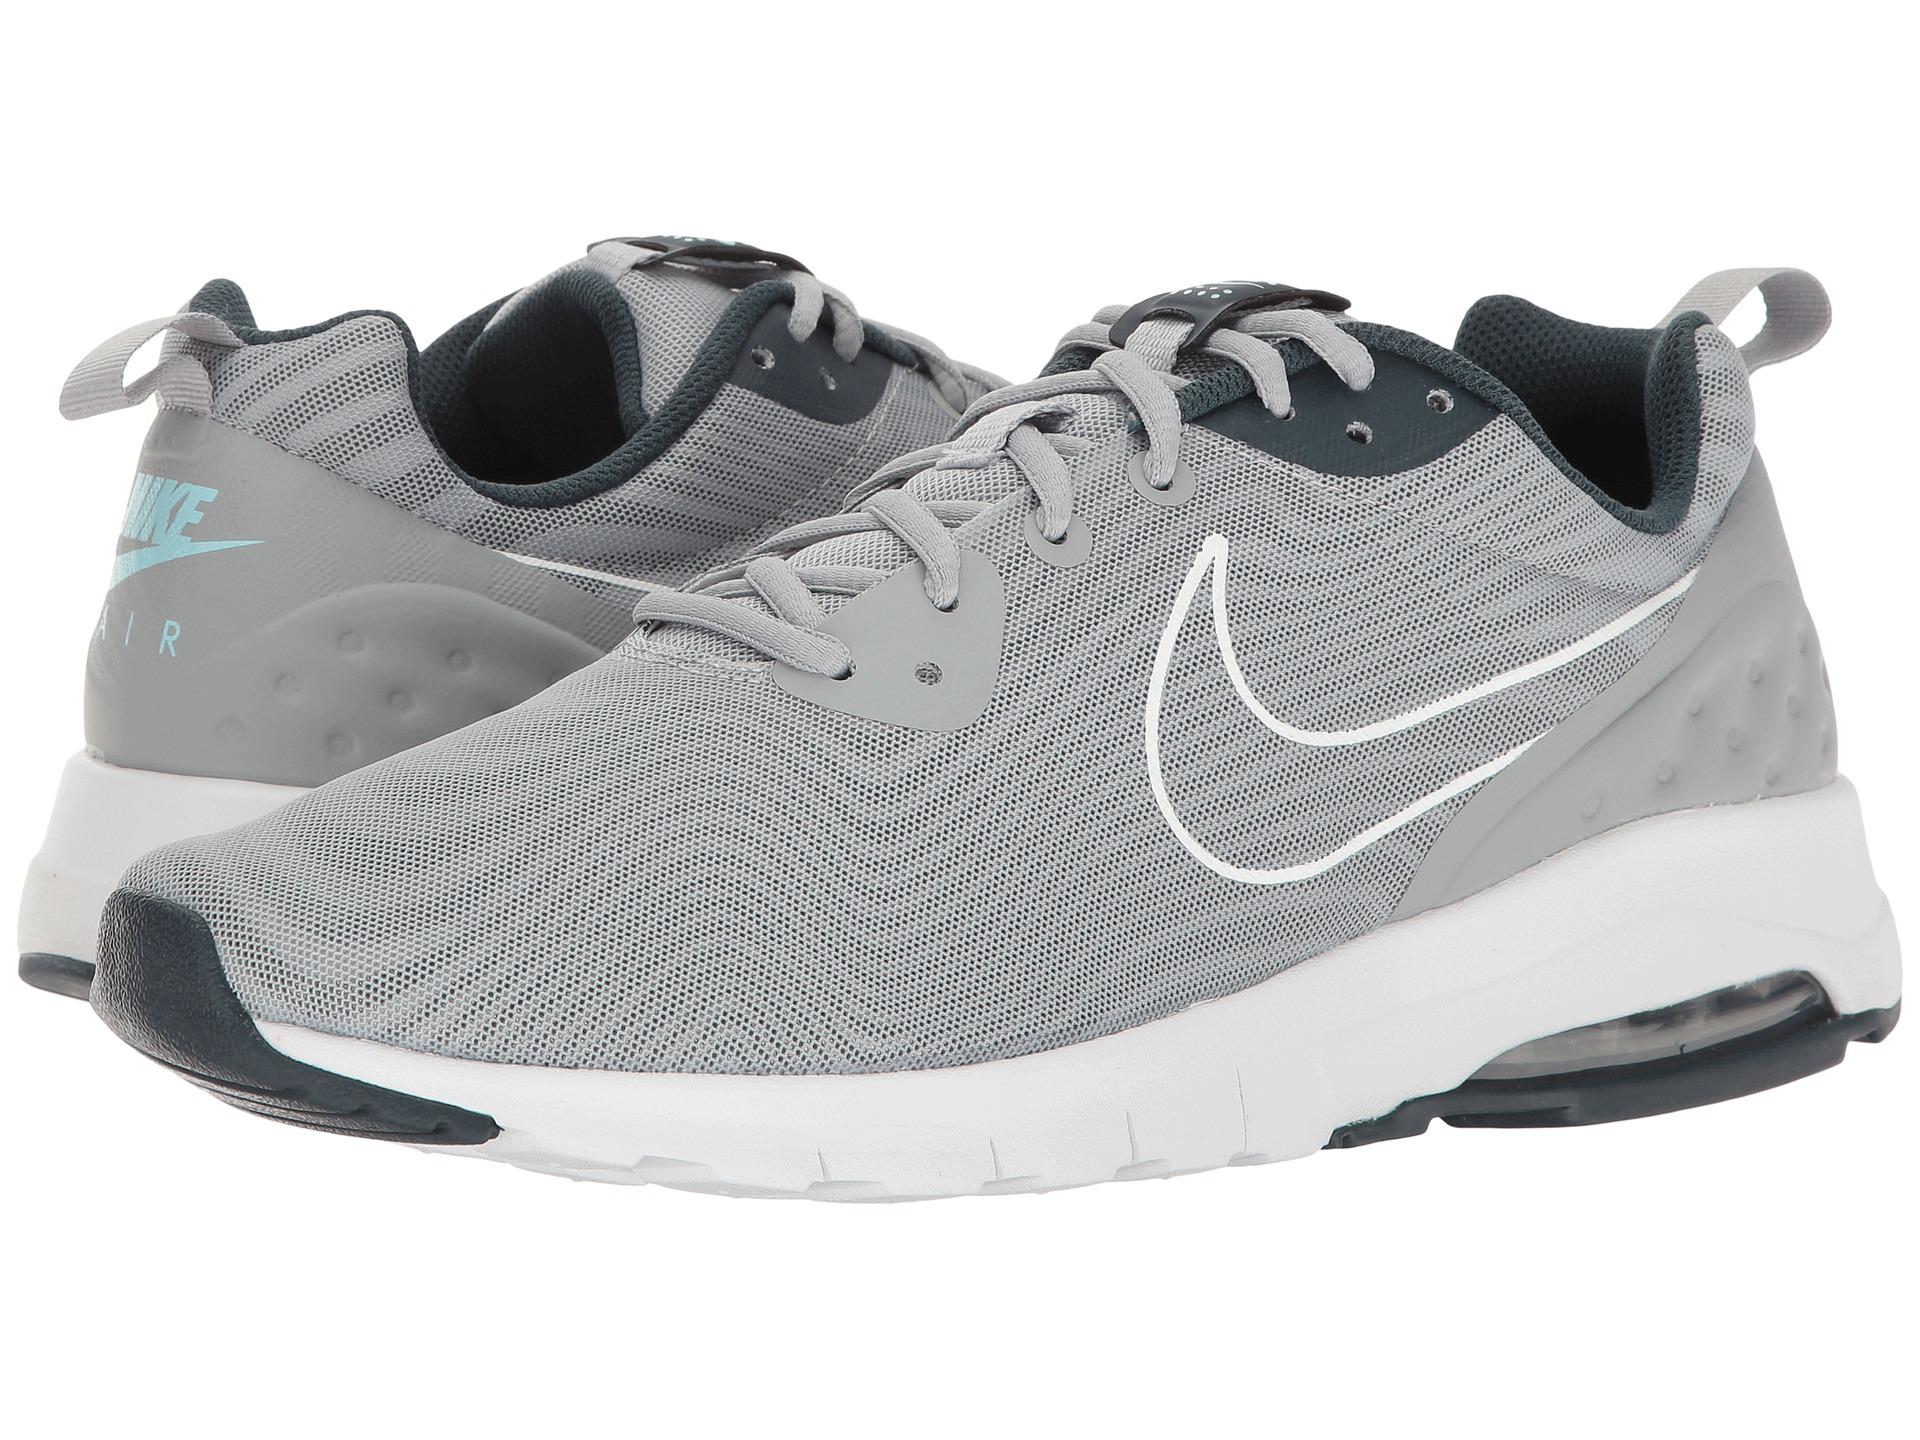 Nike Air Max Motion Low Premium Herren Sneaker Laufschuhe grau 861537 003